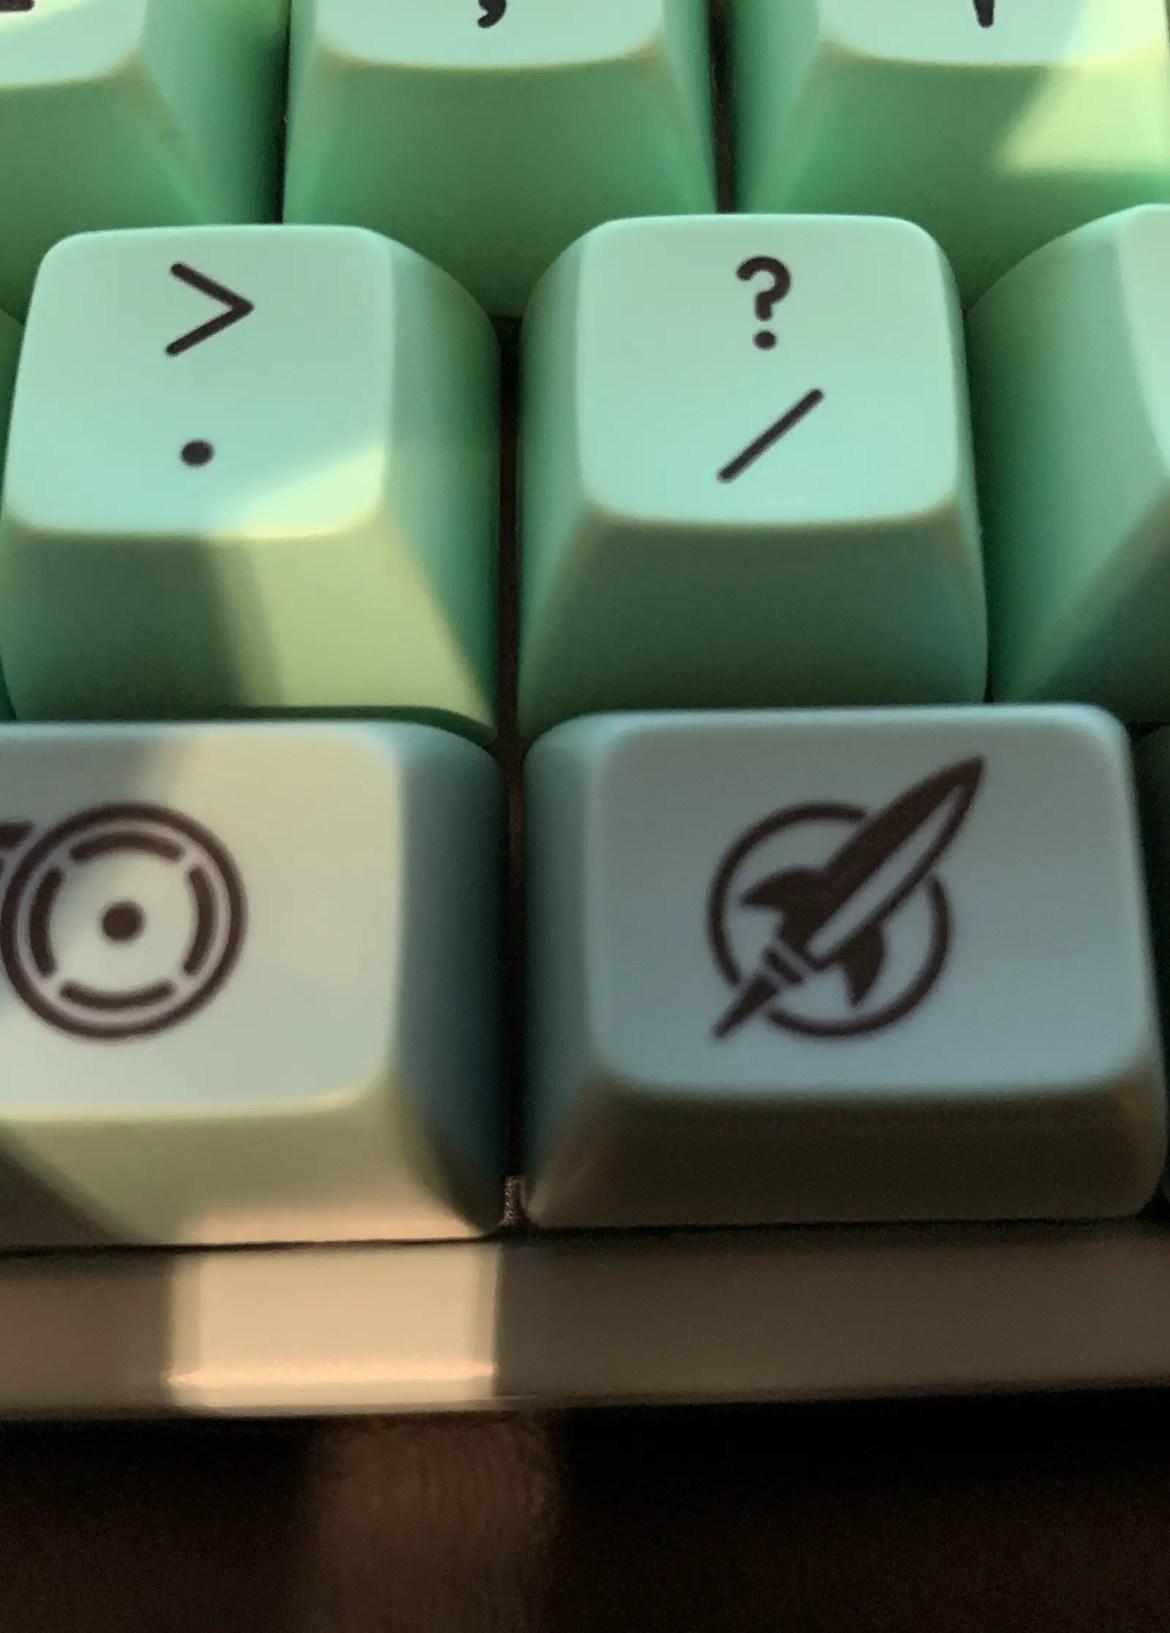 Review: The Mercury Rocketeer Keyboard